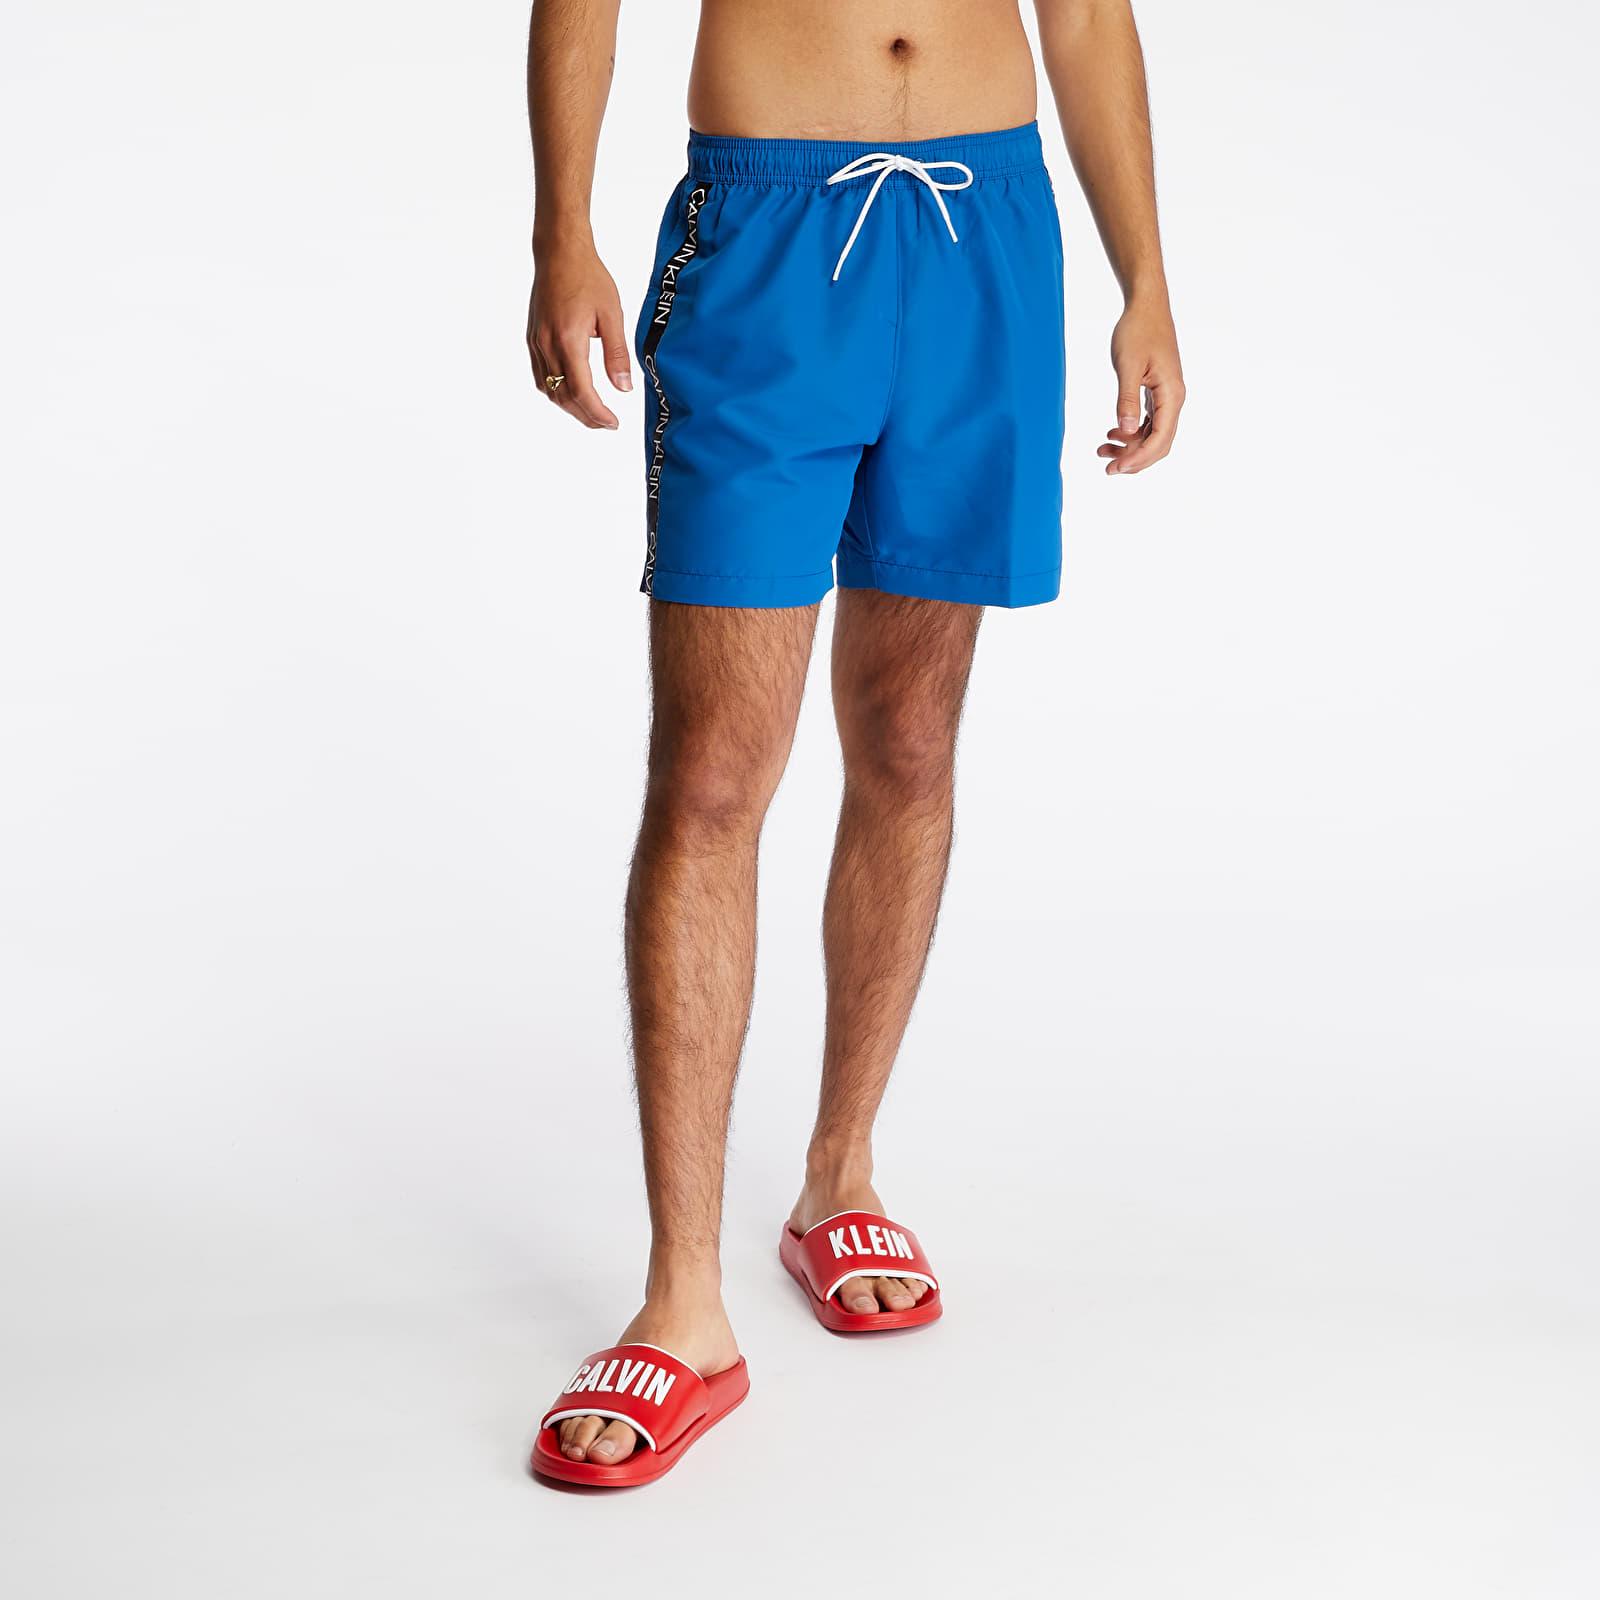 Swimsuit Calvin Klein Medium Drawstring Swim Shorts Snorkel Blue